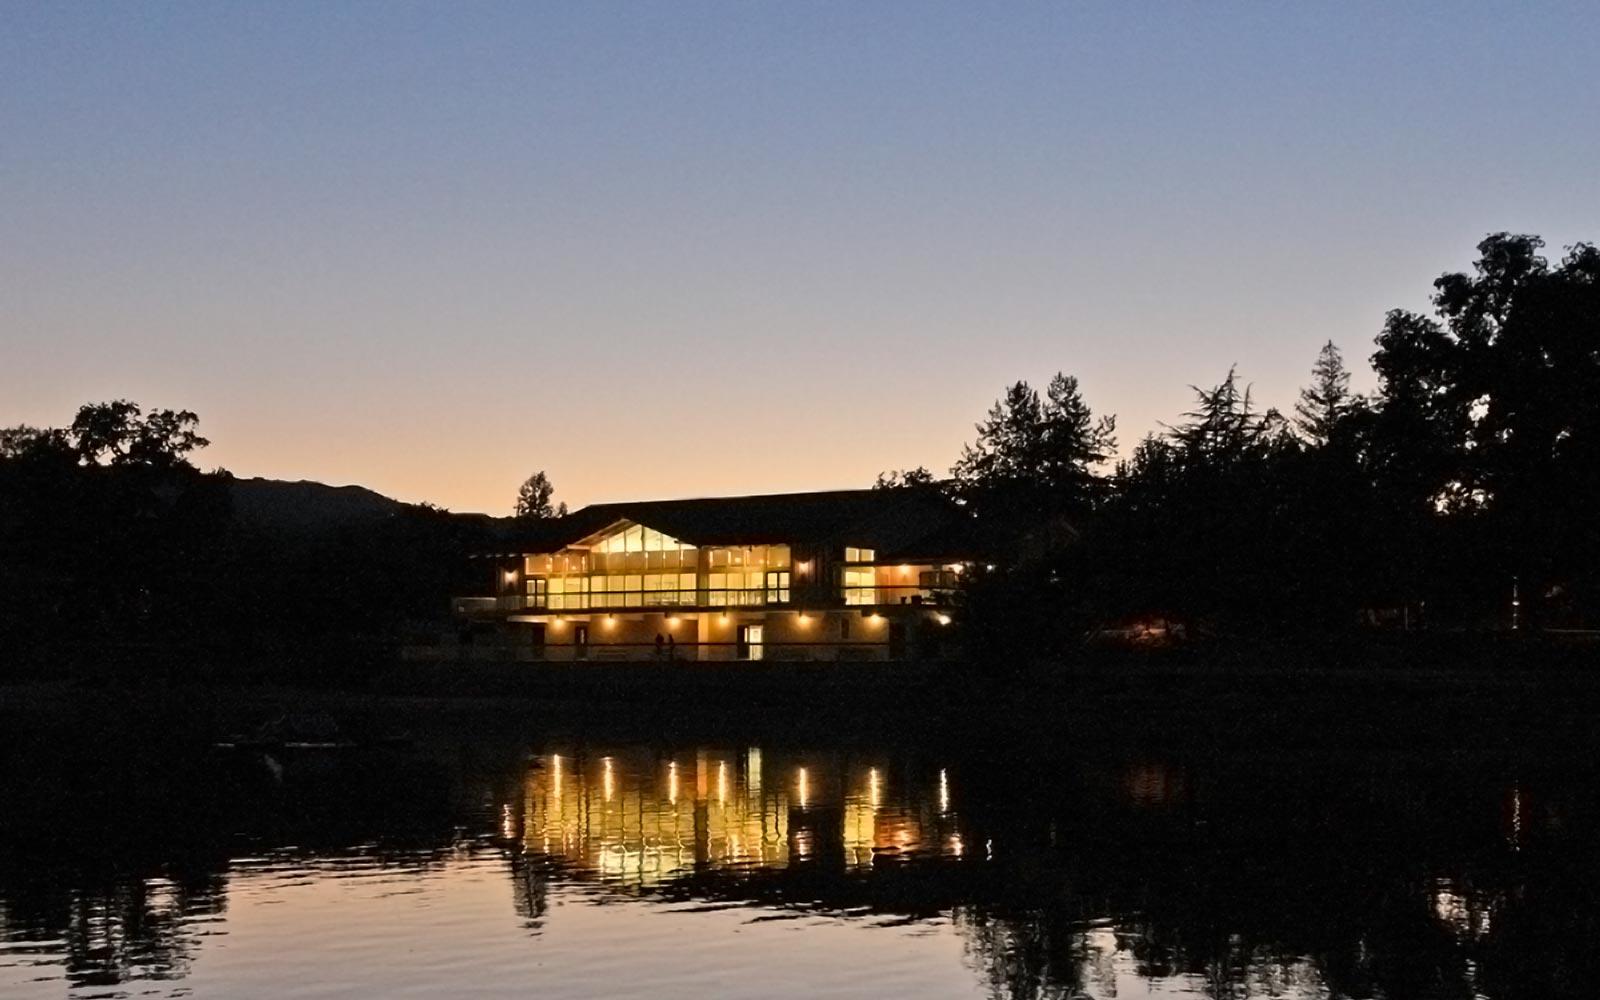 Atascadero Pavilion on the Lake at sunset featured img